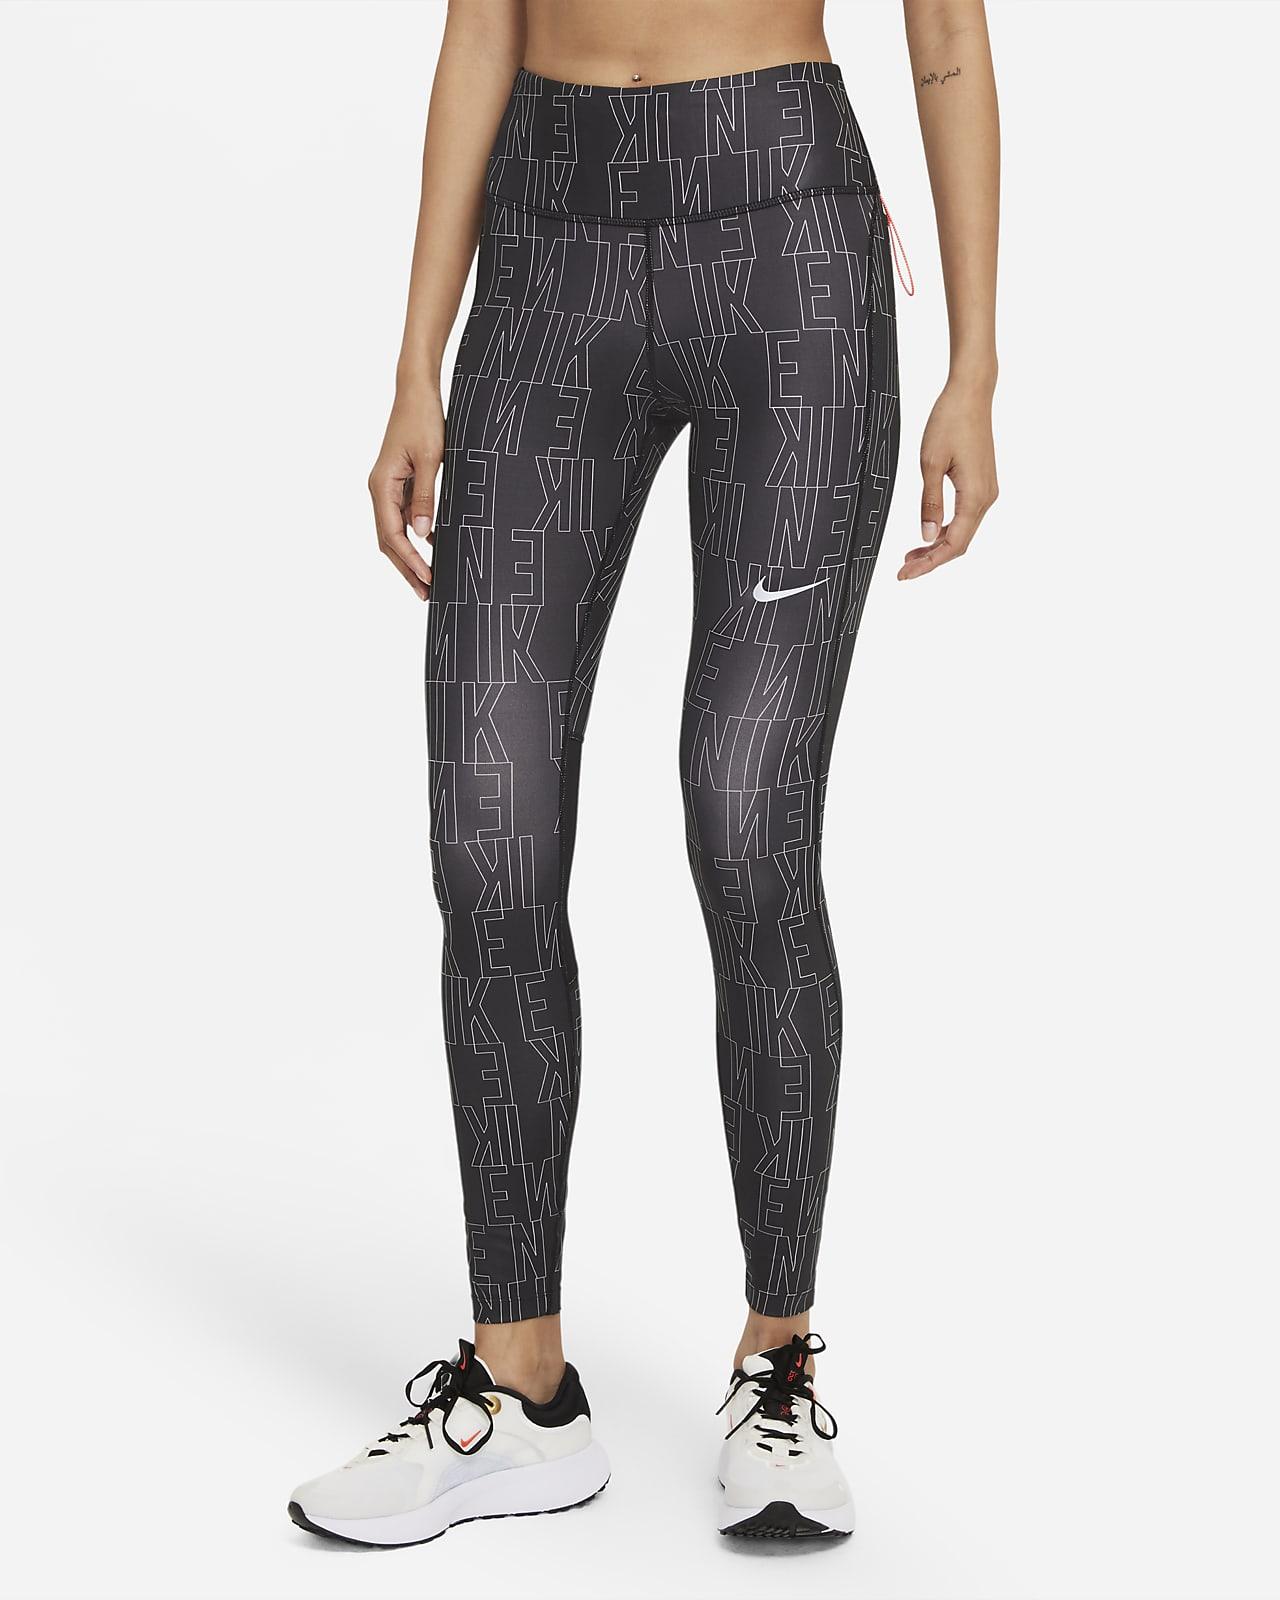 Legging de running taille mi-basse Nike Dri-FIT Run Division Epic Fast pour Femme